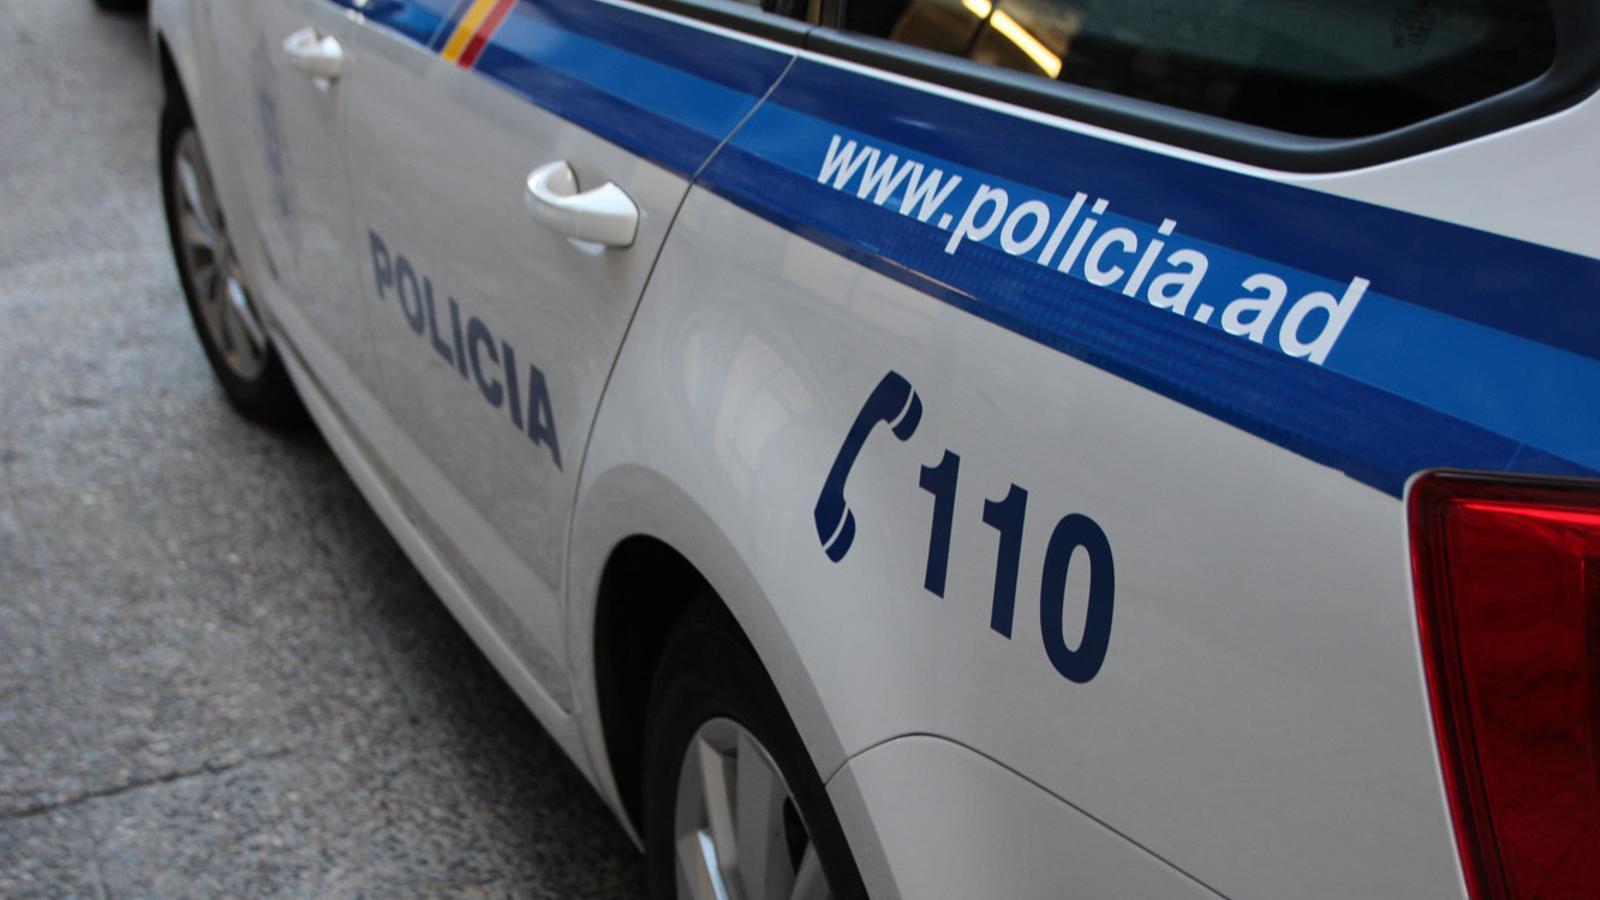 La policia va detenir 18 persones la setmana passada. / ARXIU ANA